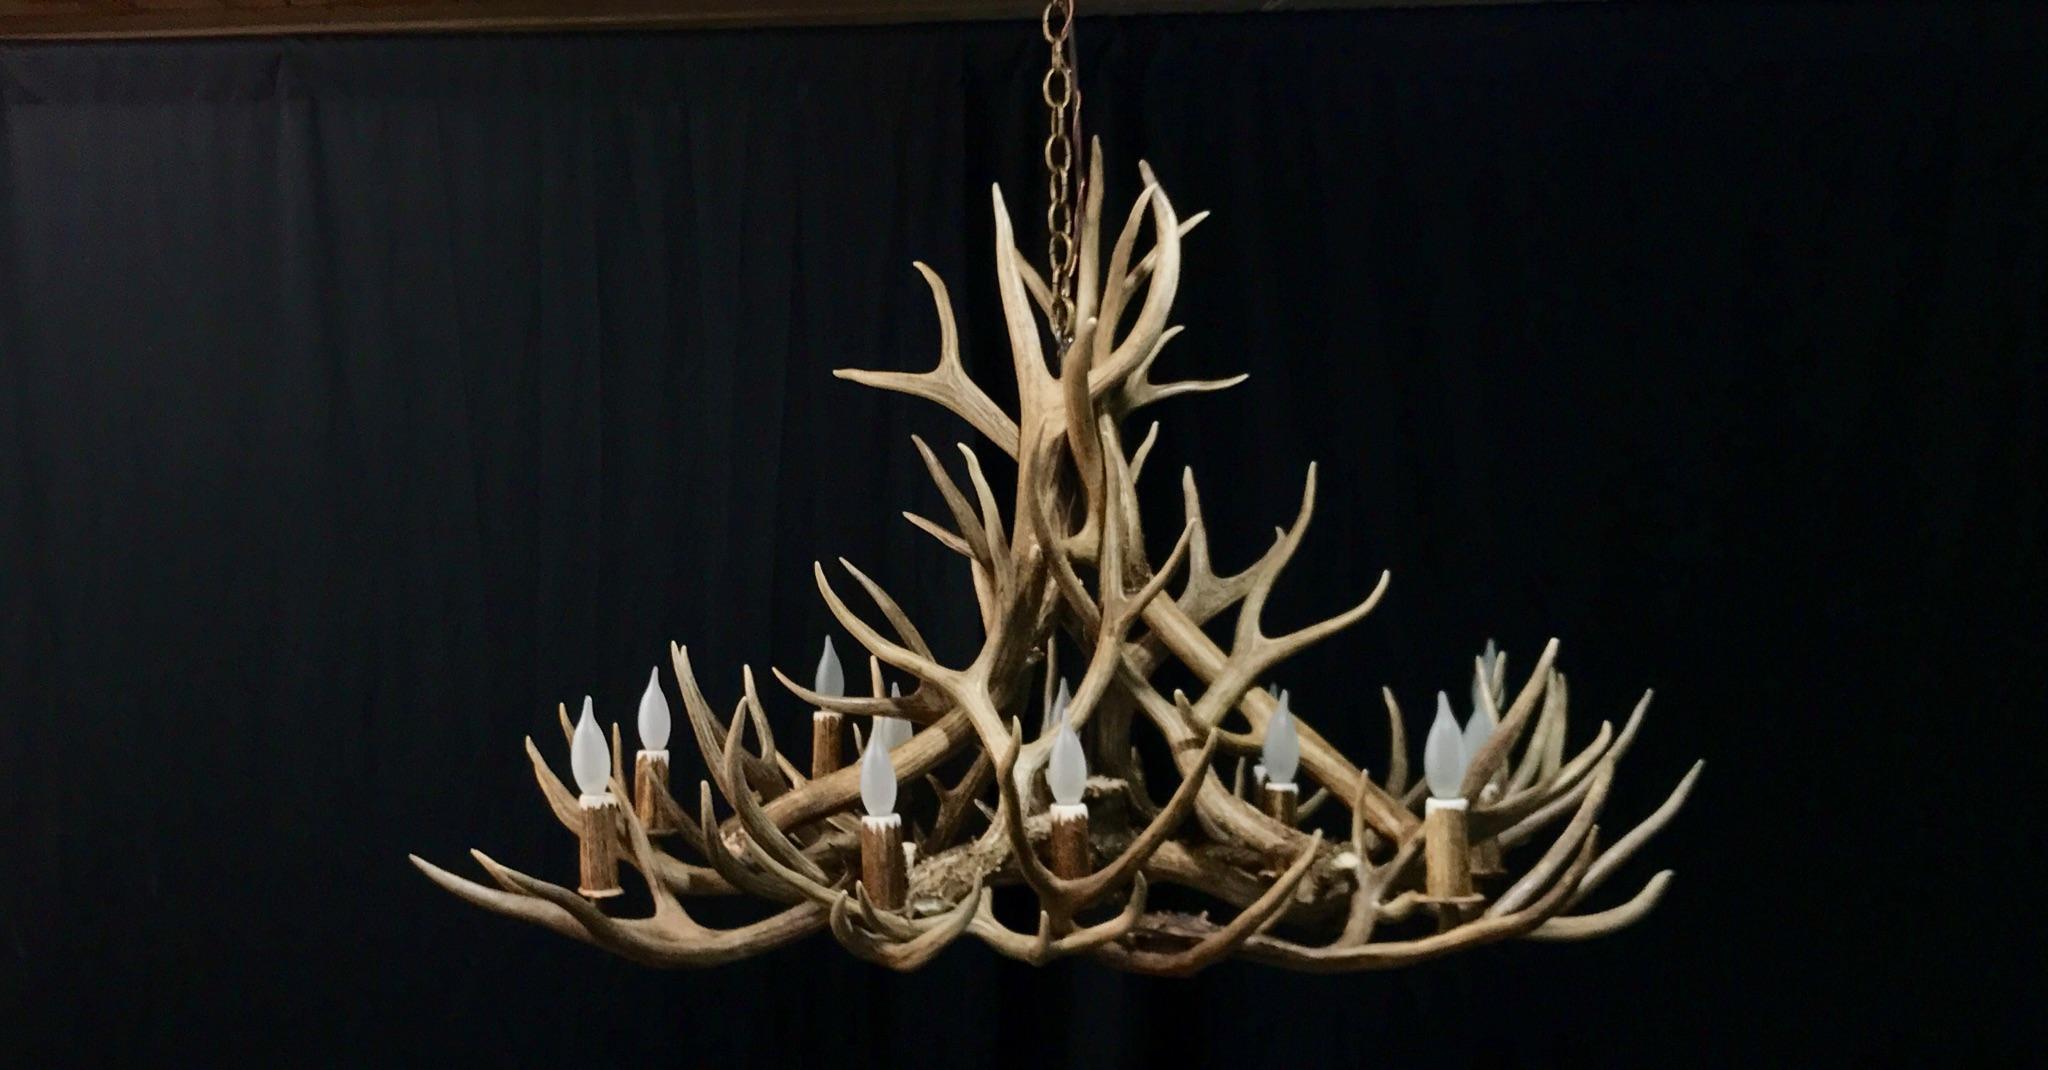 Oblong antler chandelier